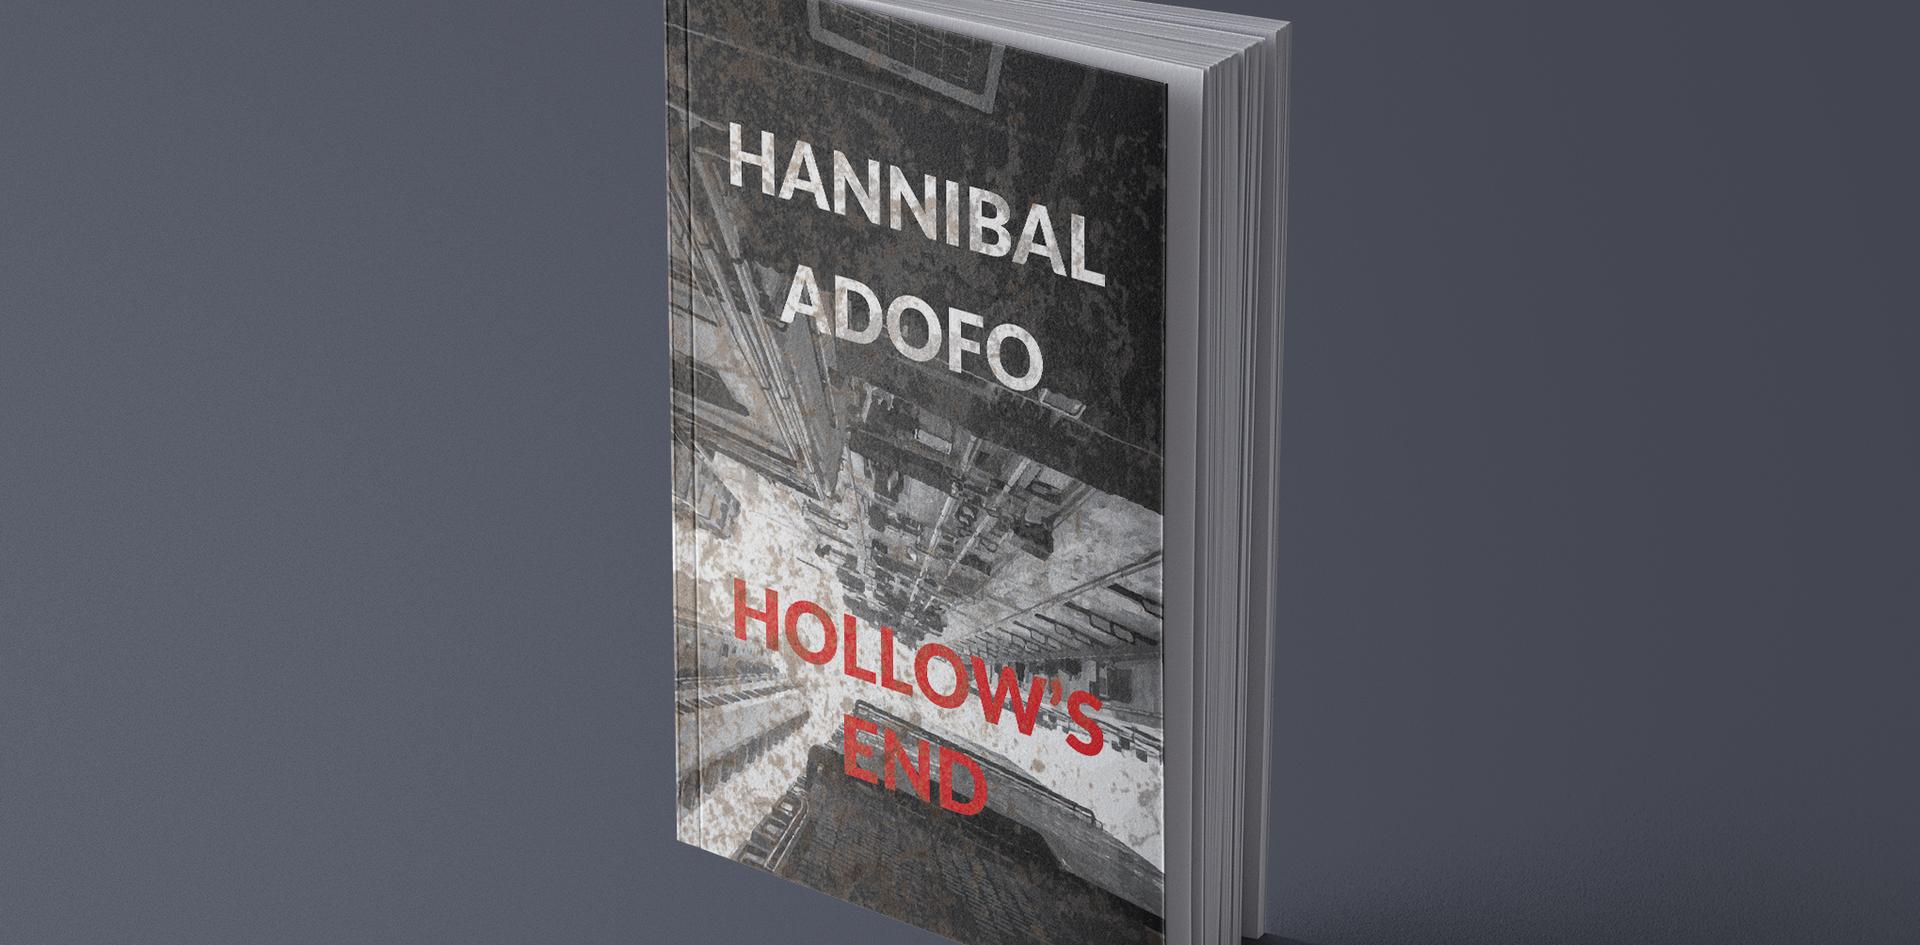 HANNIBAL ADOFO II.png